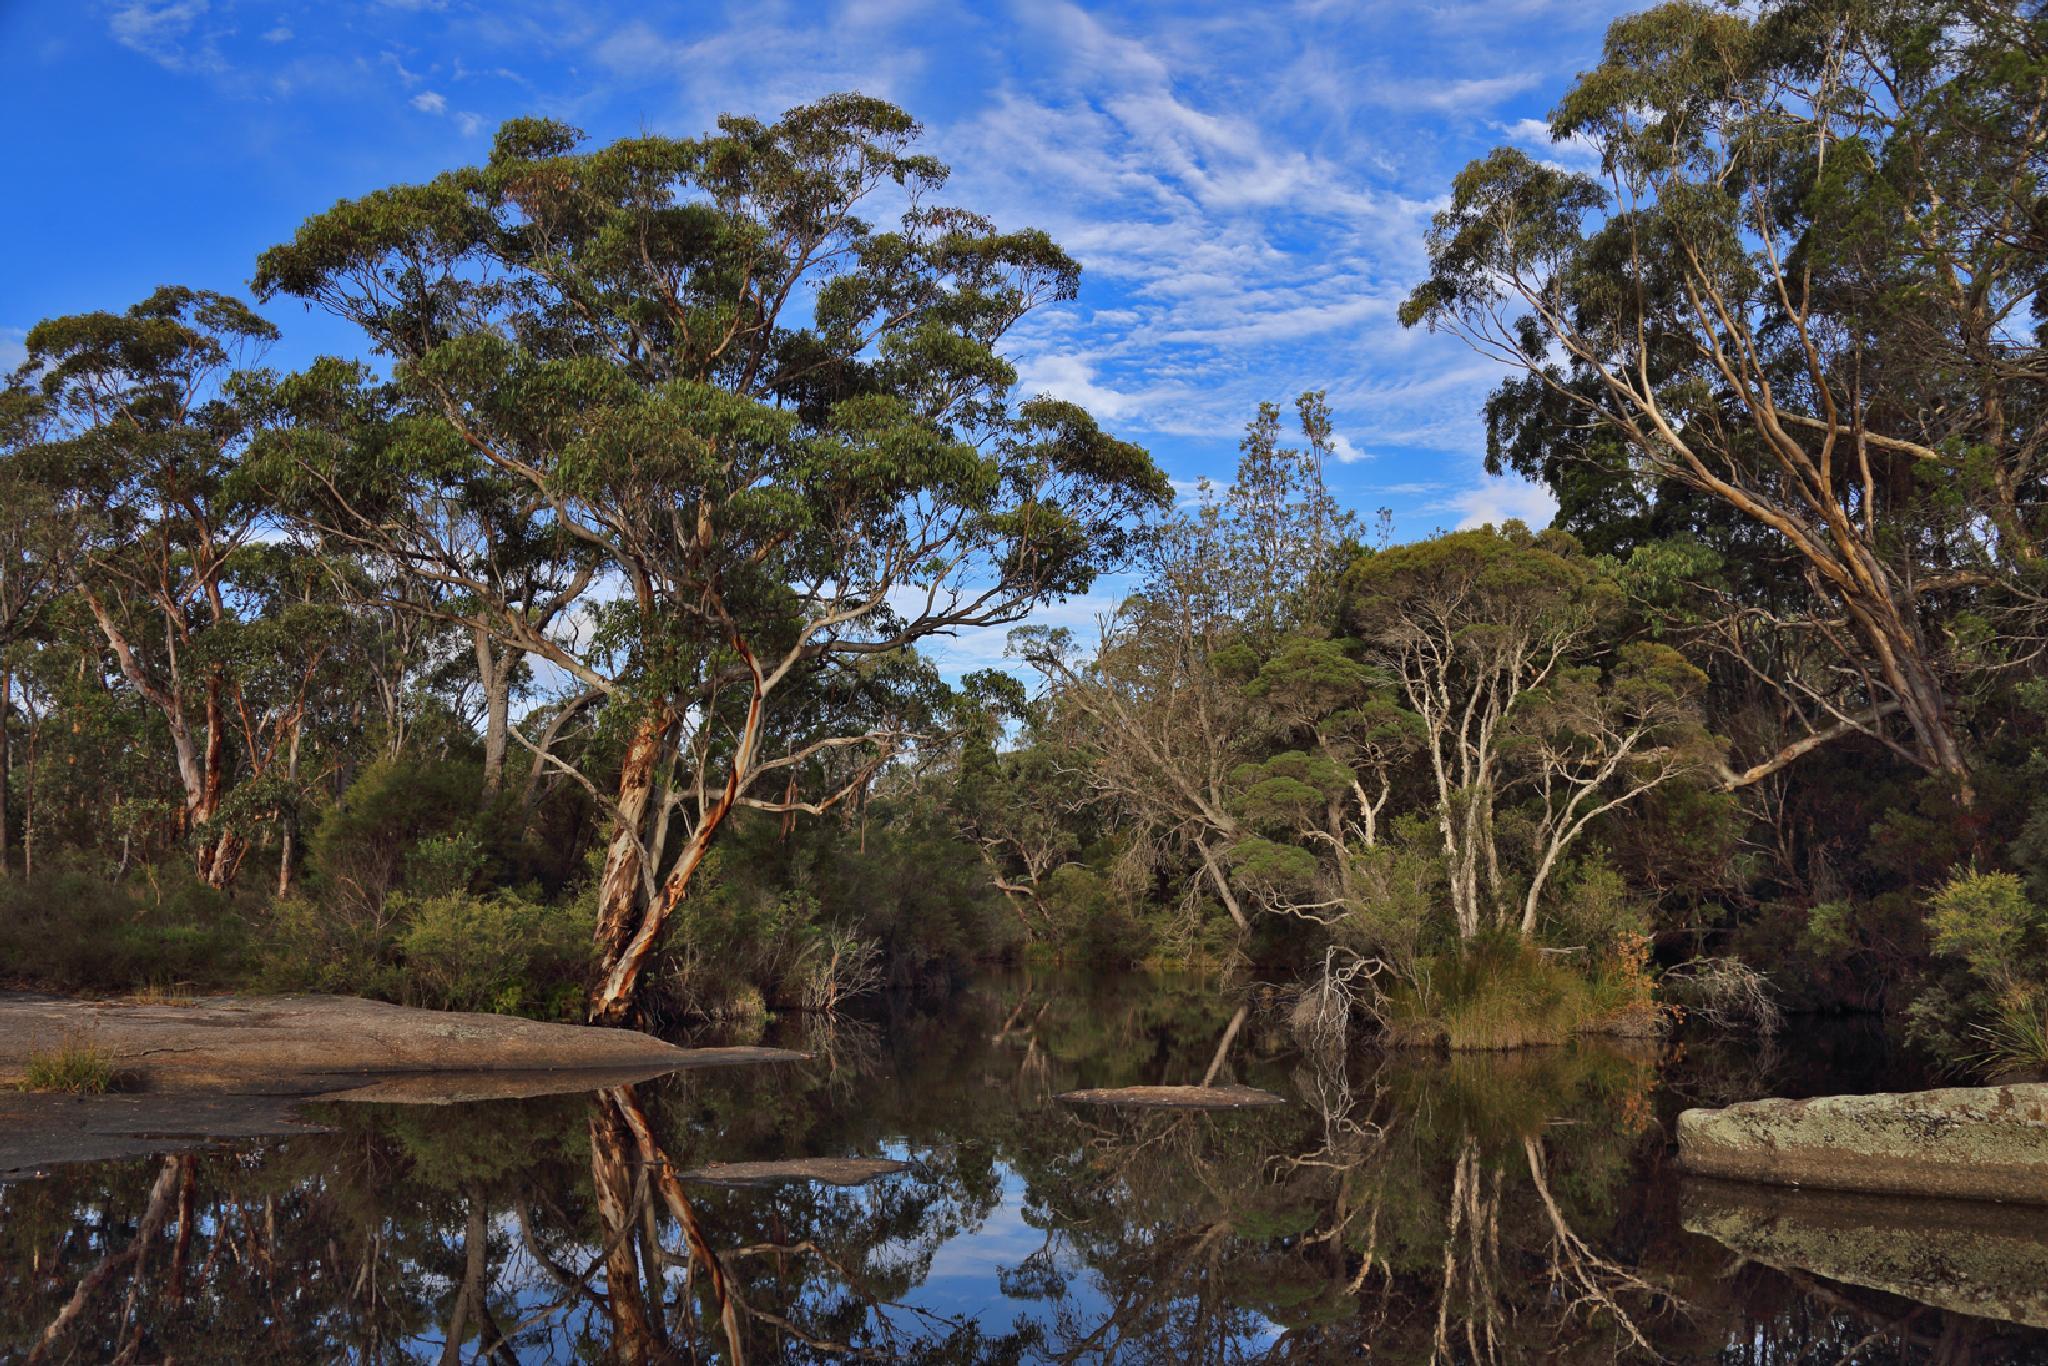 Reflections at Bald Rock Creek by Chris Ryan